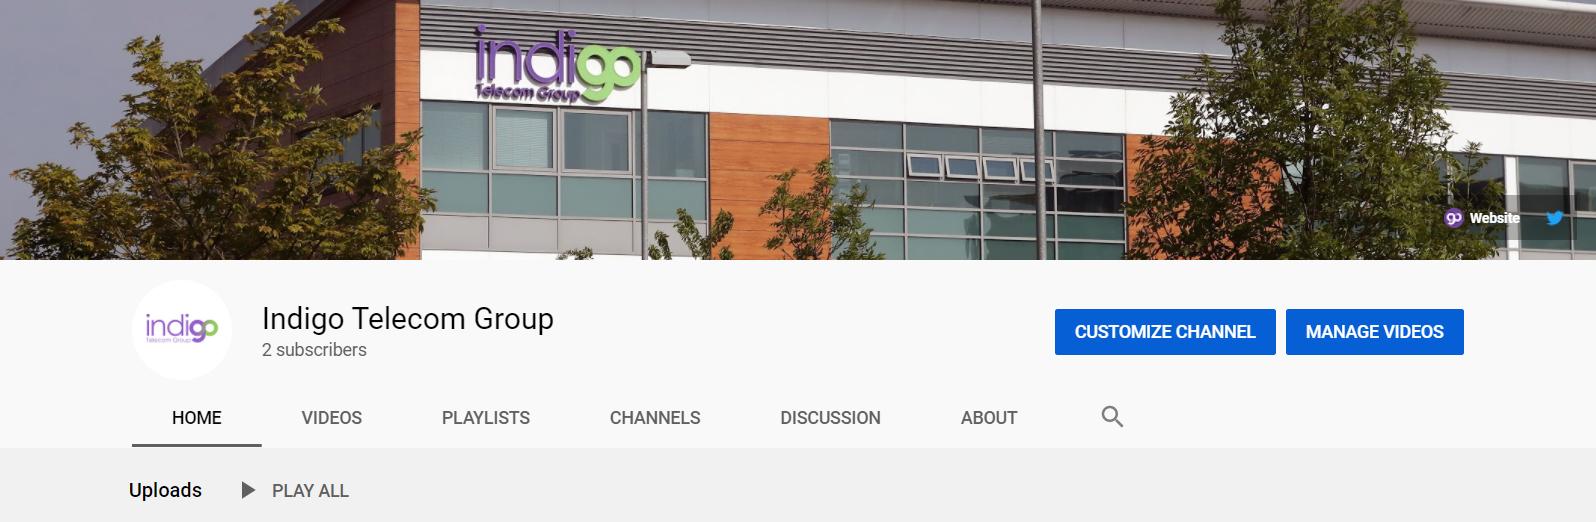 Indigo Telecom Group YouTube Channel